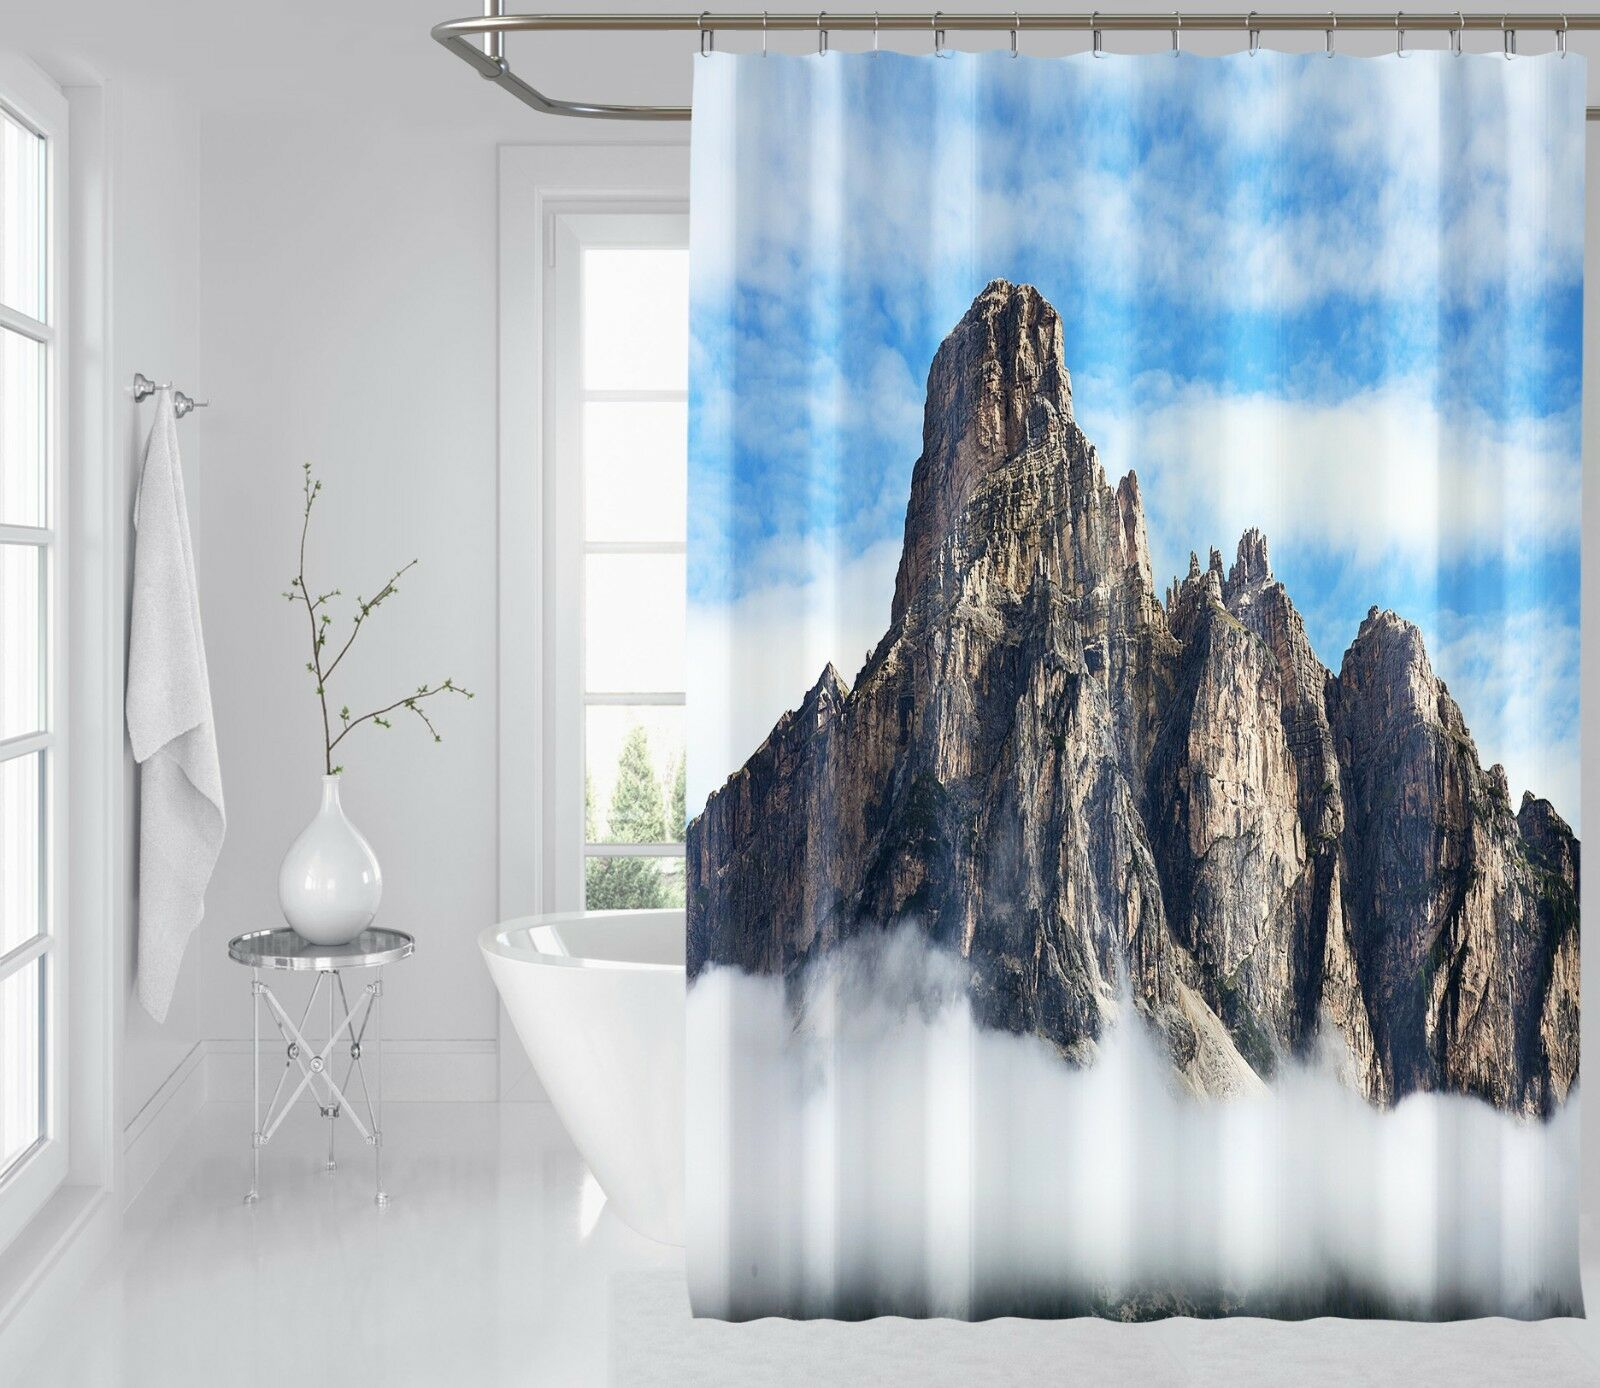 3D Mountain Peak 1 Shower Curtain Waterproof Fiber Fiber Fiber Bathroom Home Windows Toilet ba0fb7